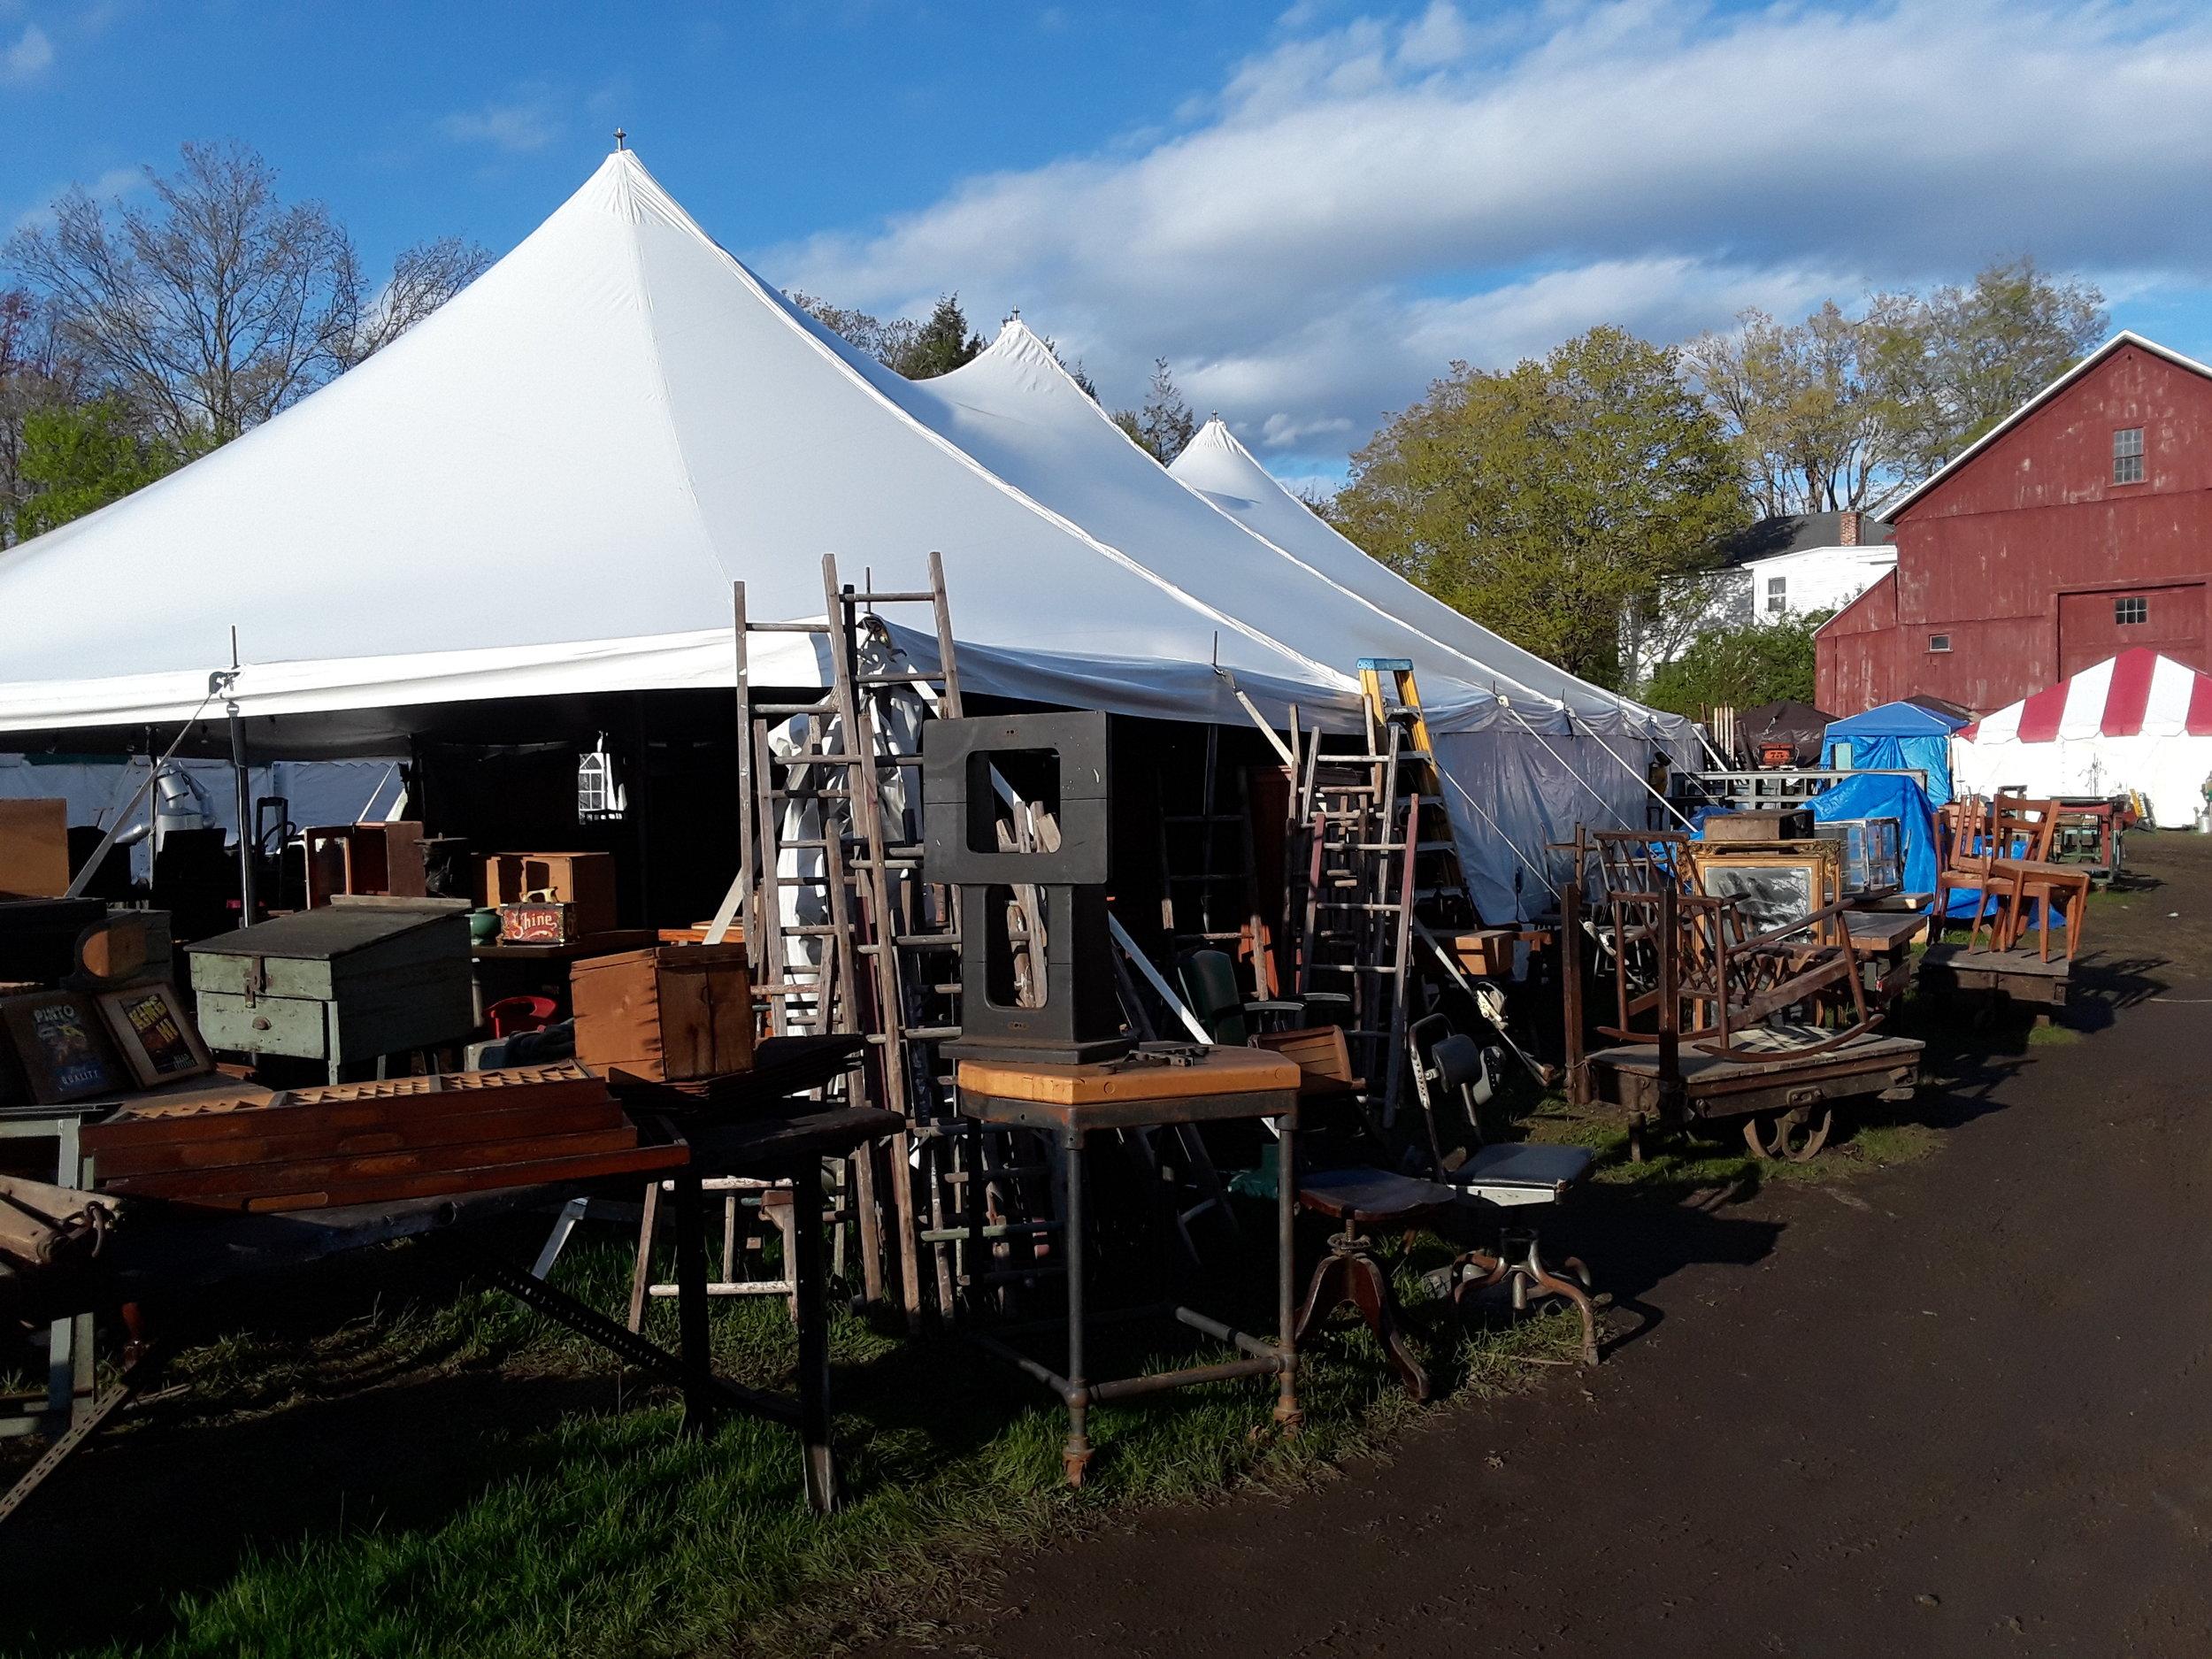 just one larger dealer tent